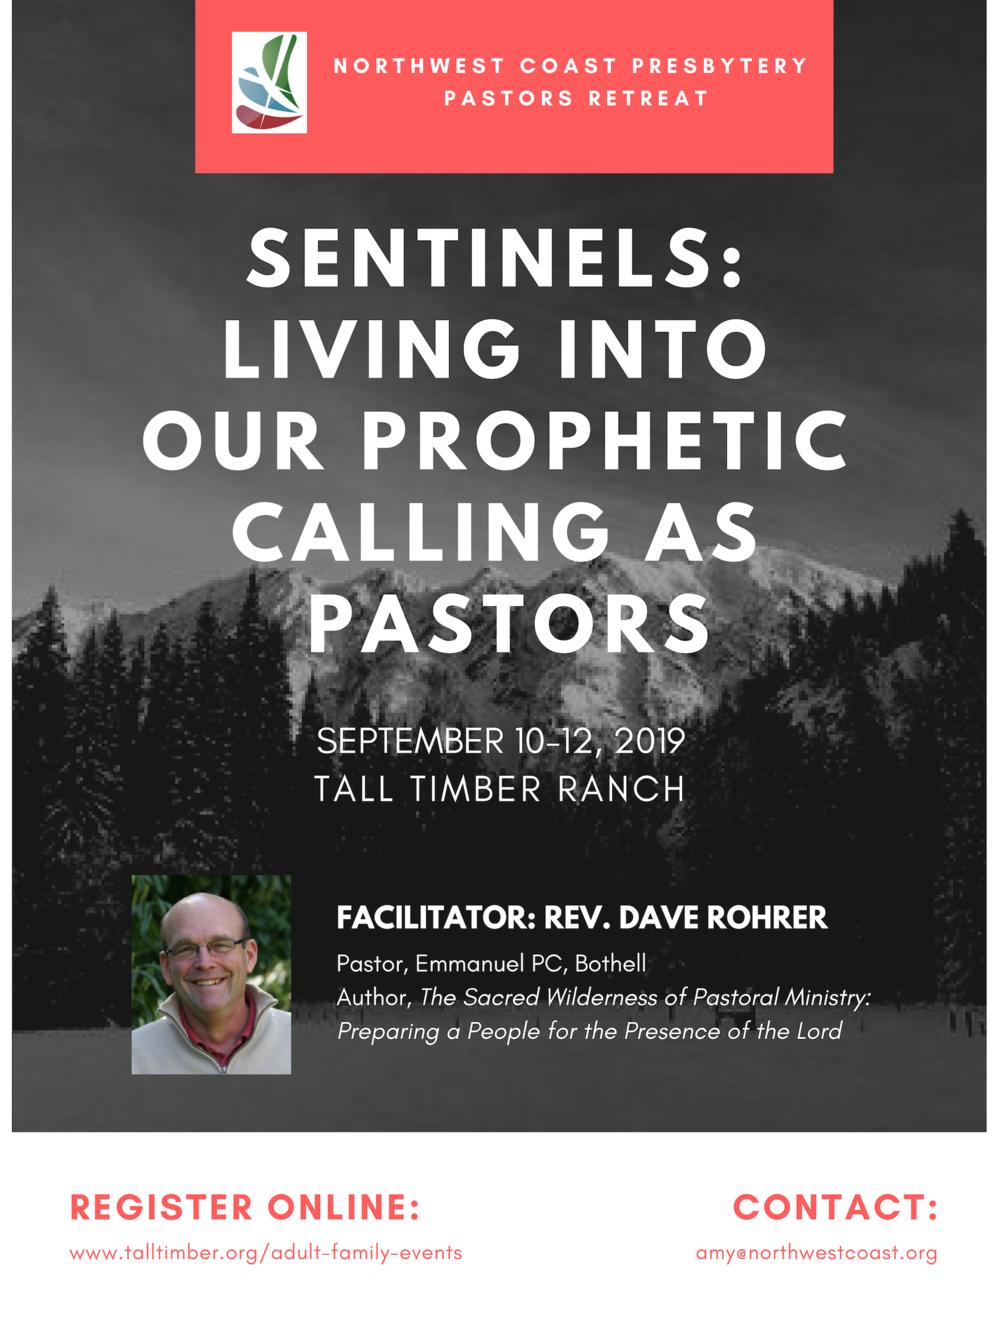 northwest coast presbytery pastors retreat (1).png